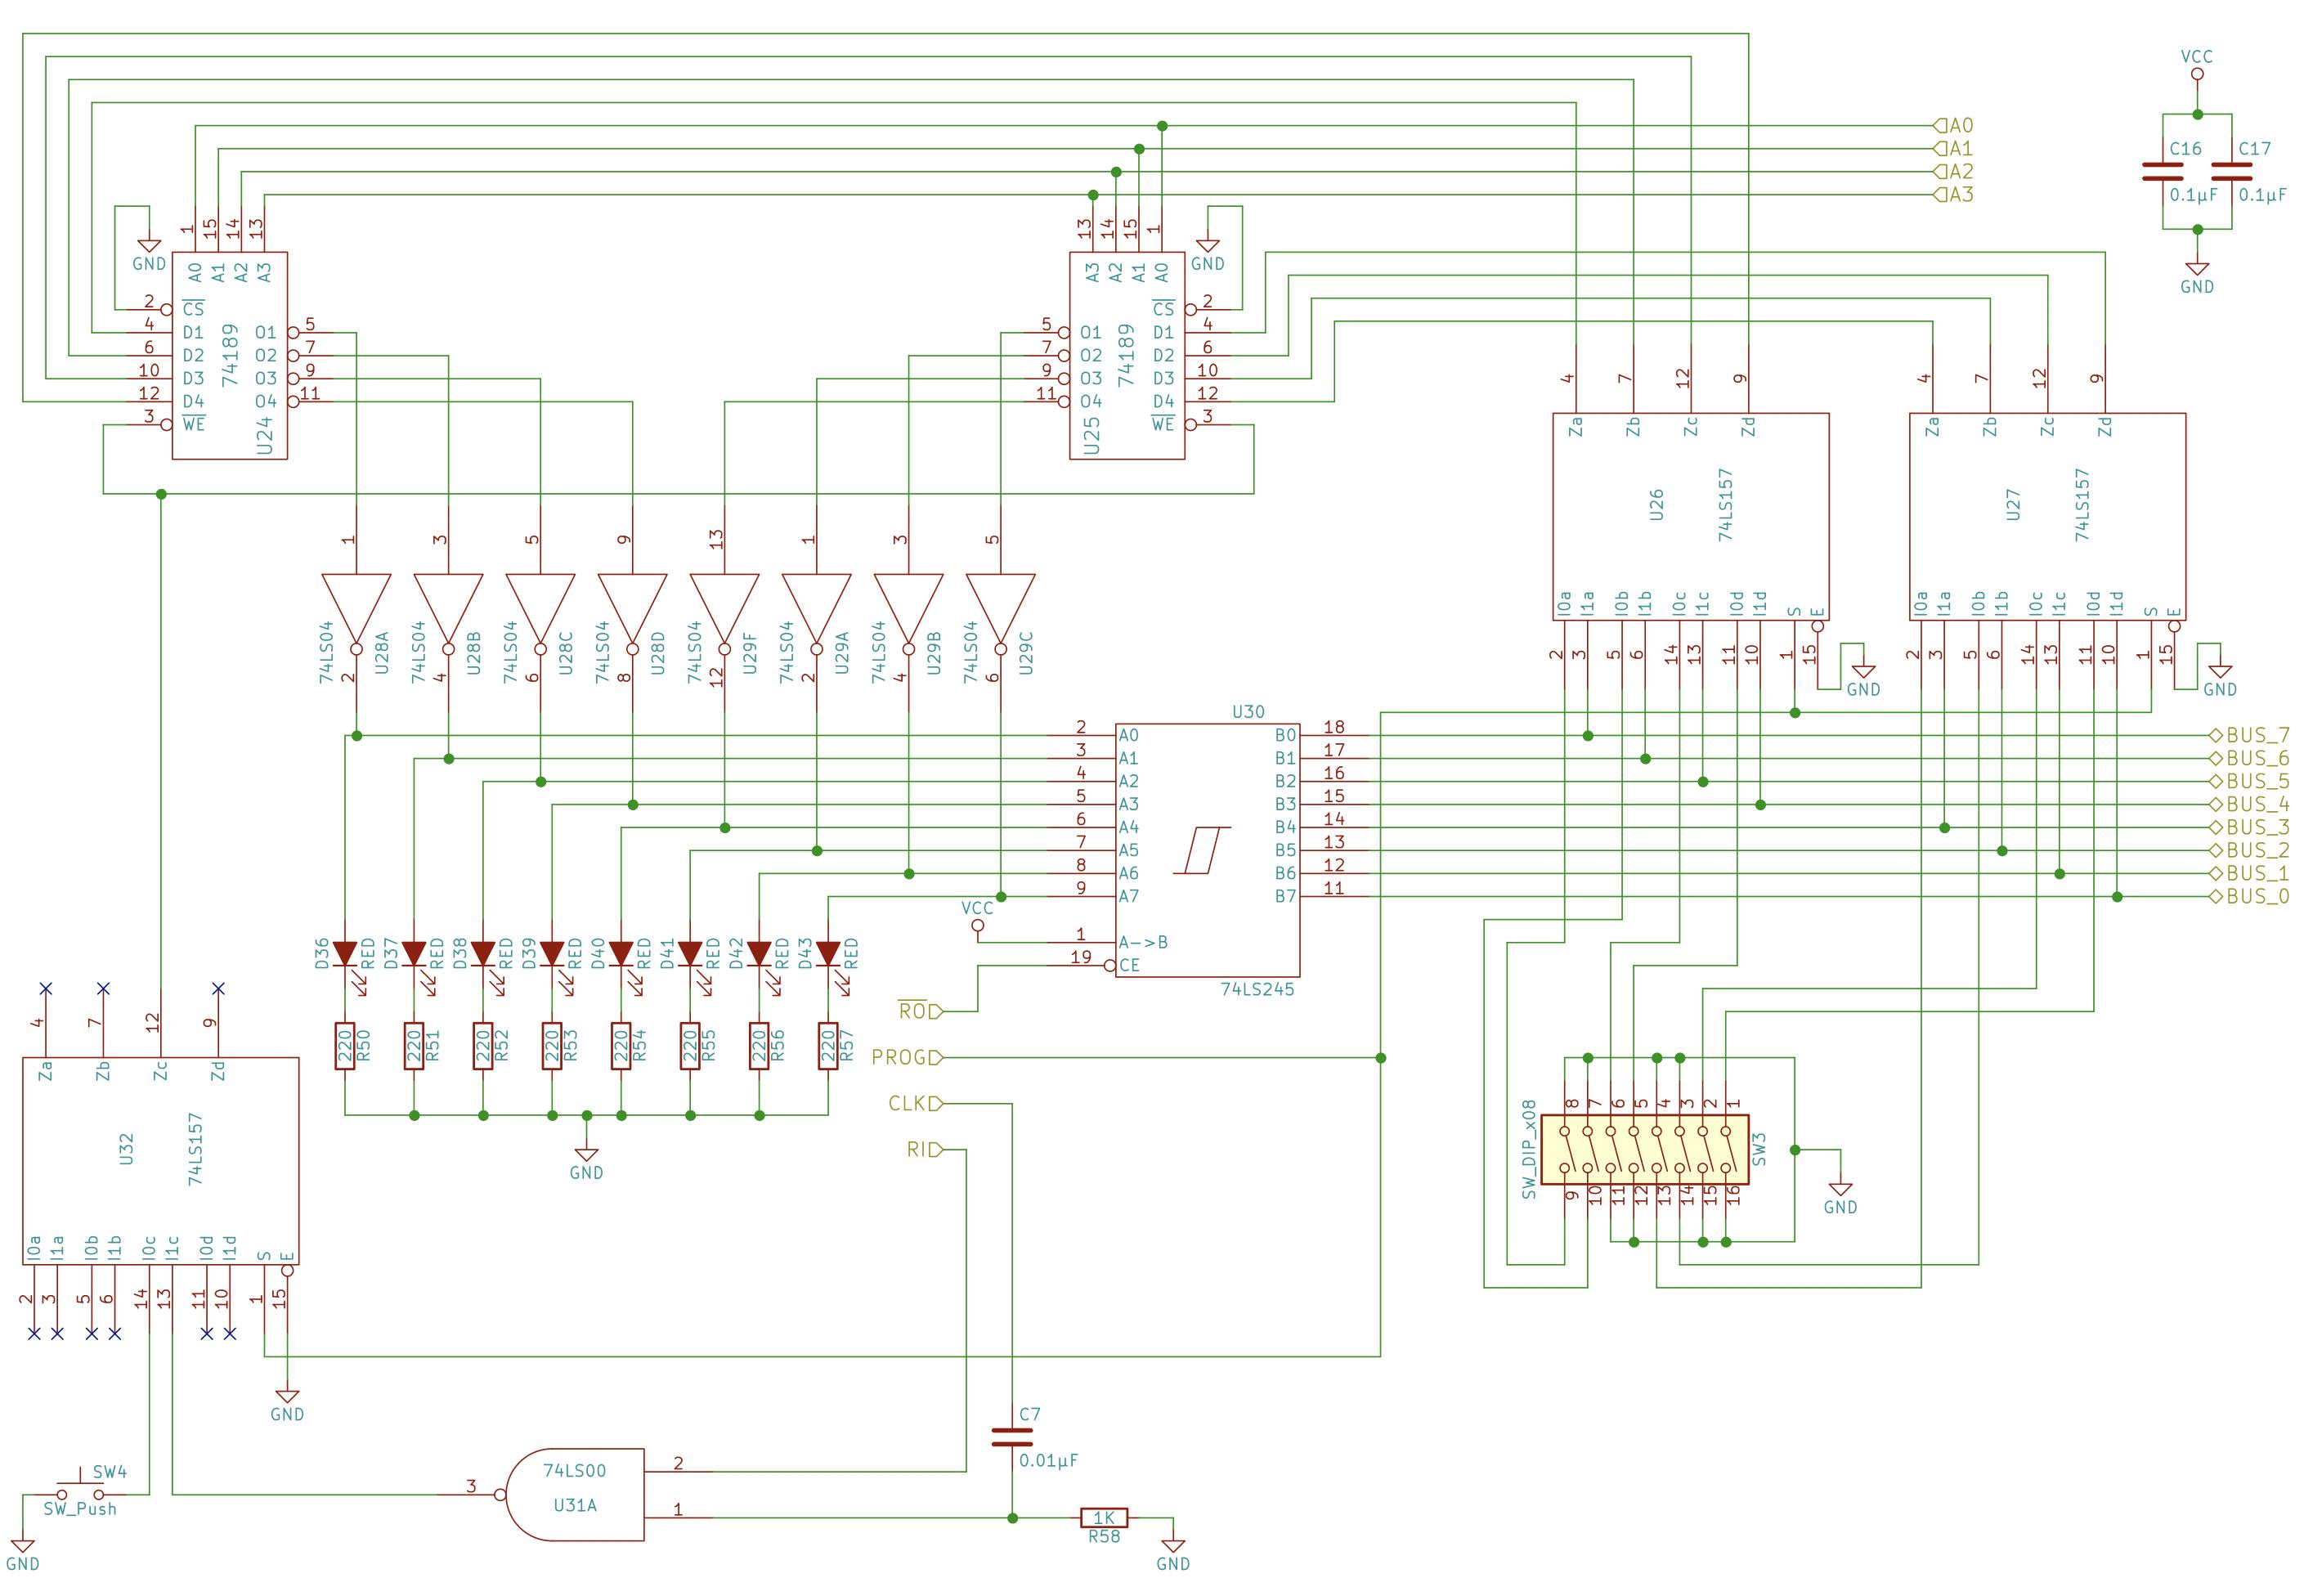 schematic of the ram module